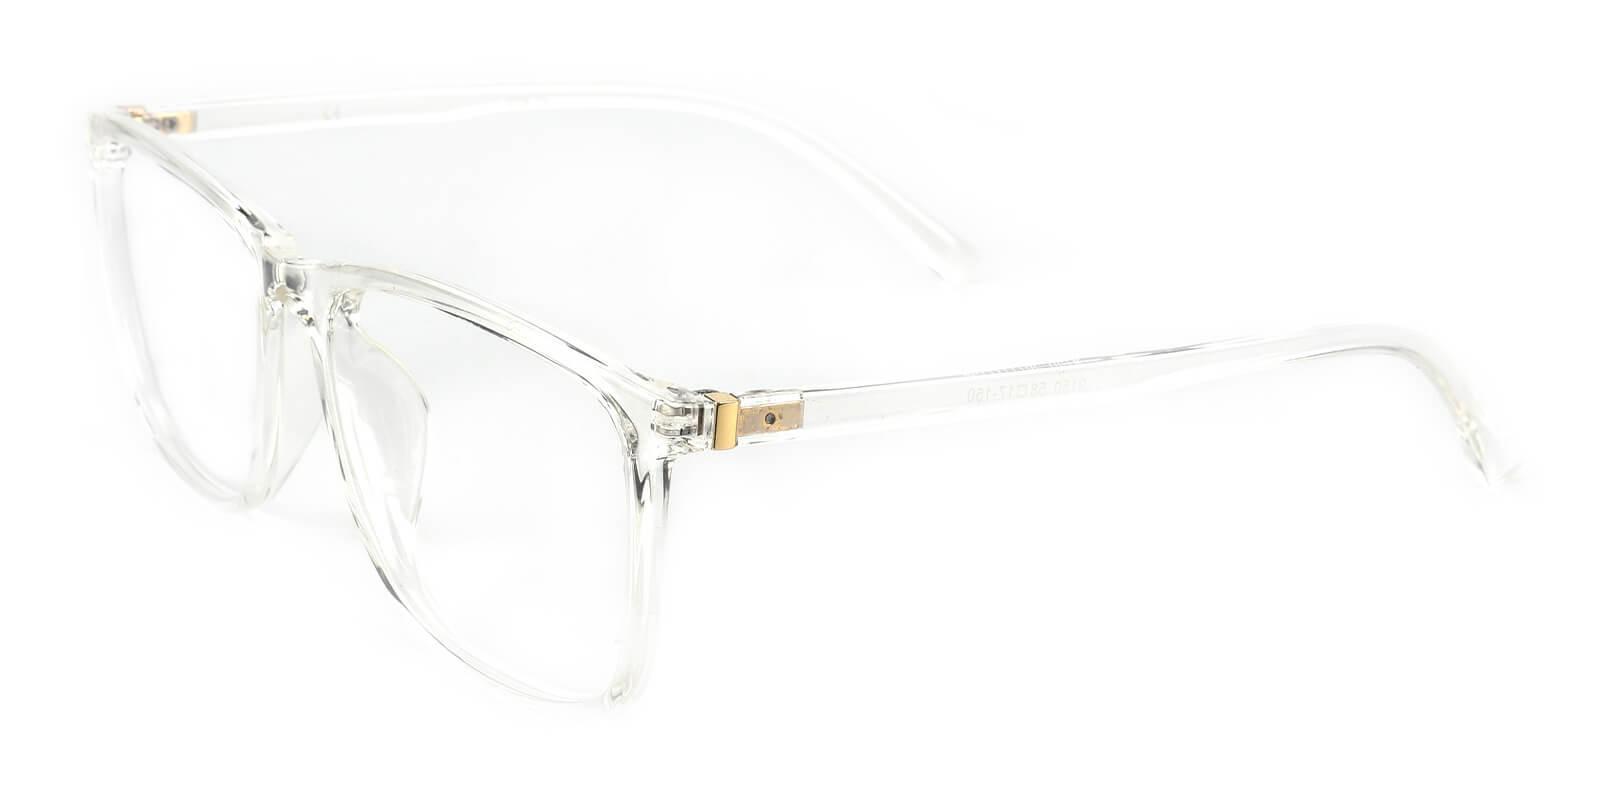 Poise-Translucent-Square-TR-Eyeglasses-additional1